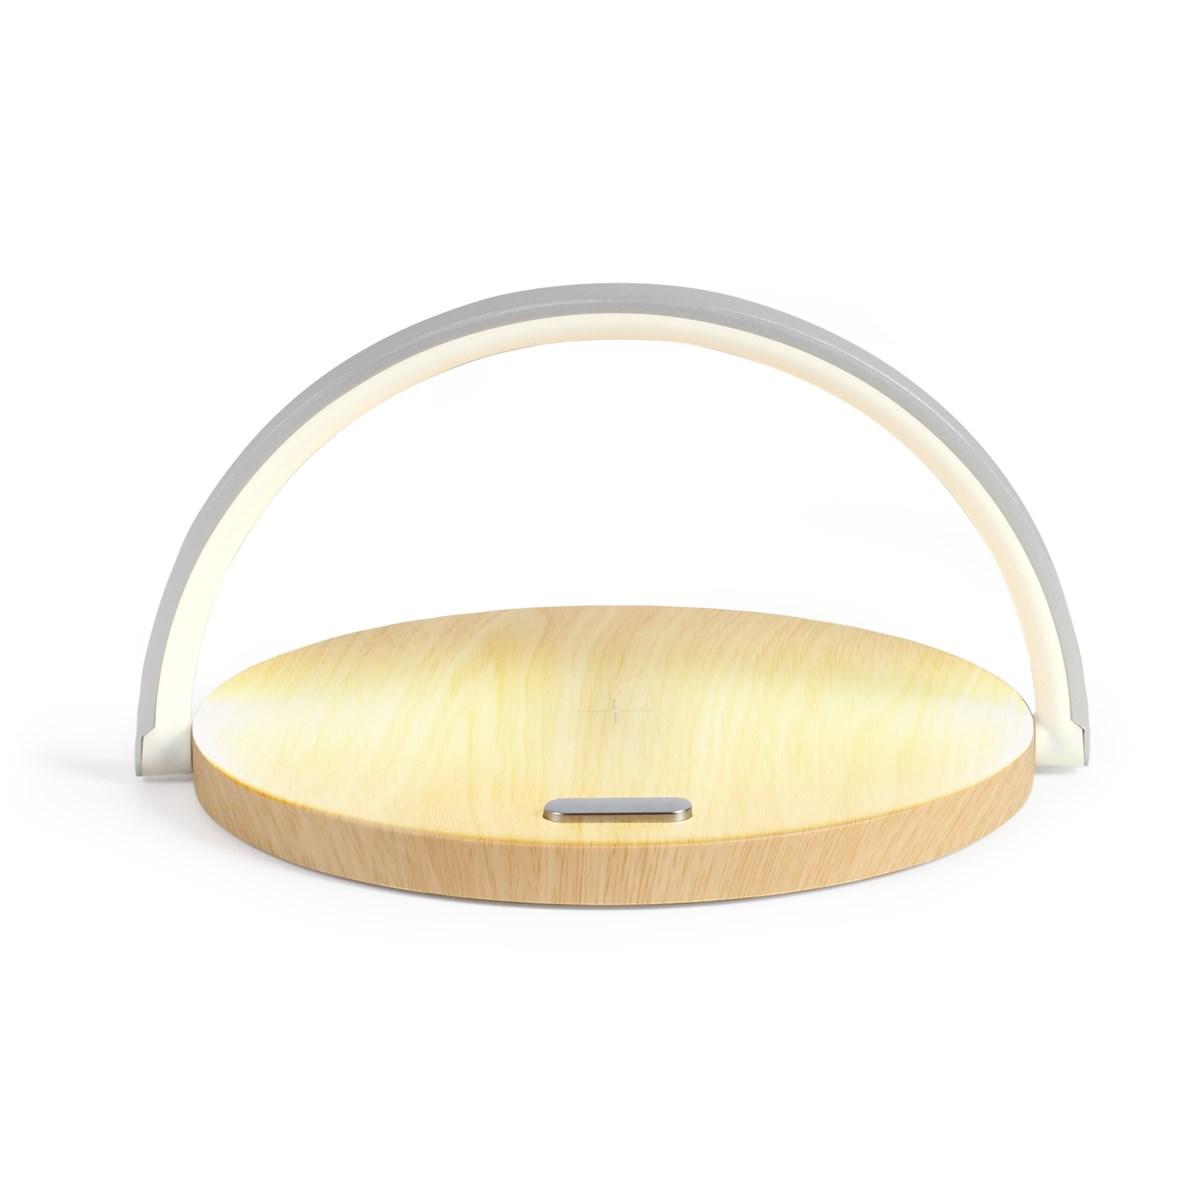 Lampe de chevet tactile 2 en 1 en ABS marron